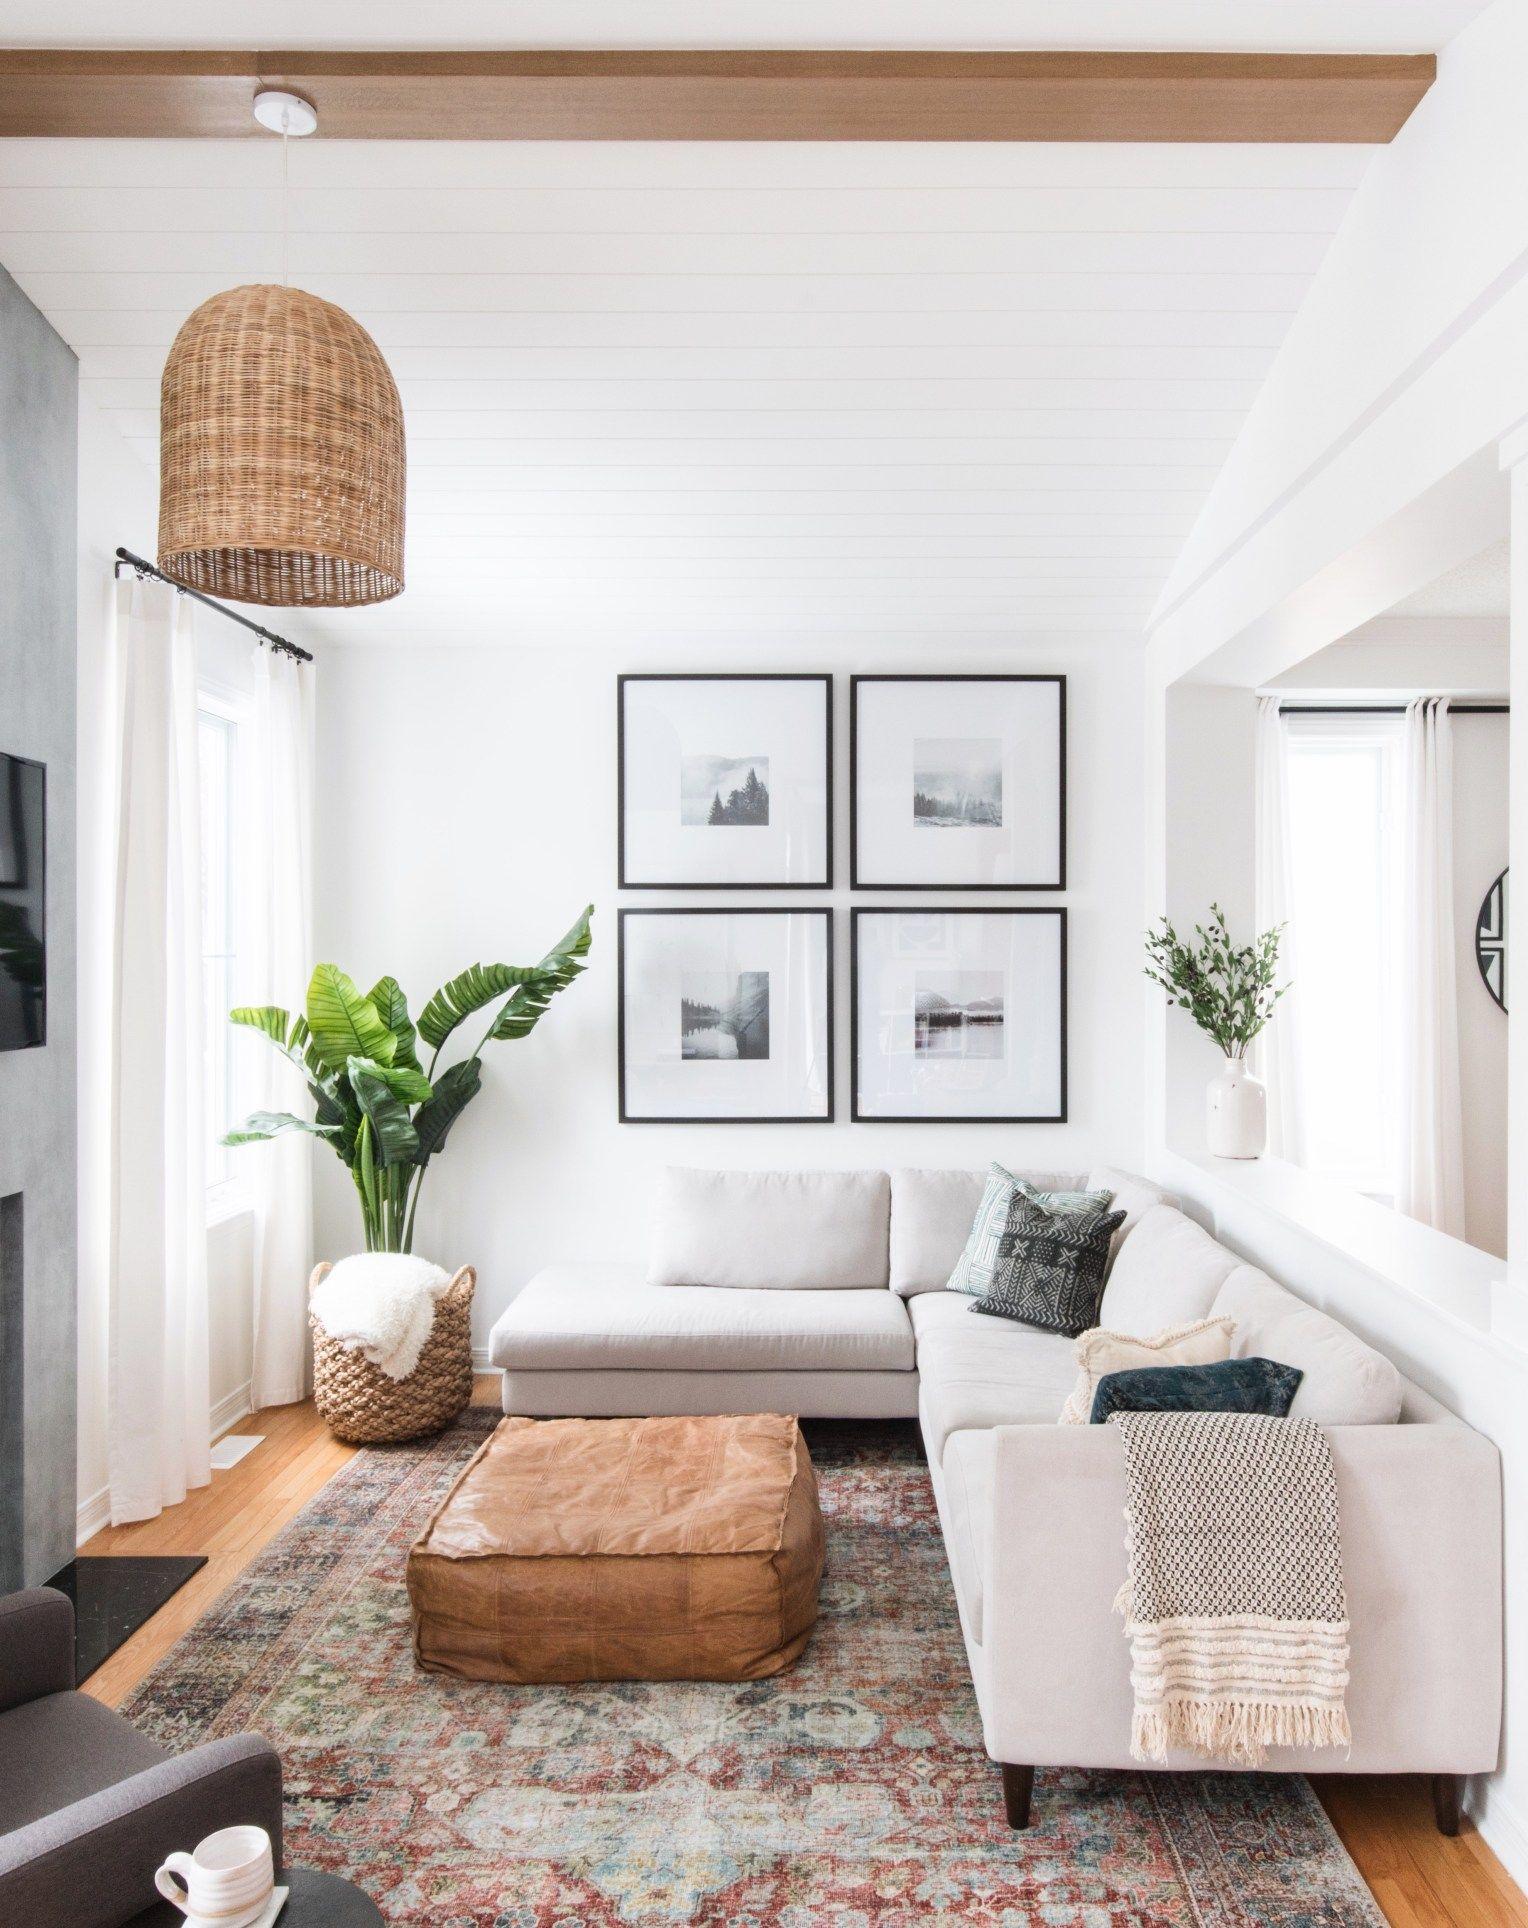 Le Clair Decor Family Room Living Room Decor Neutral Interior Design Living Room Living Room Interior